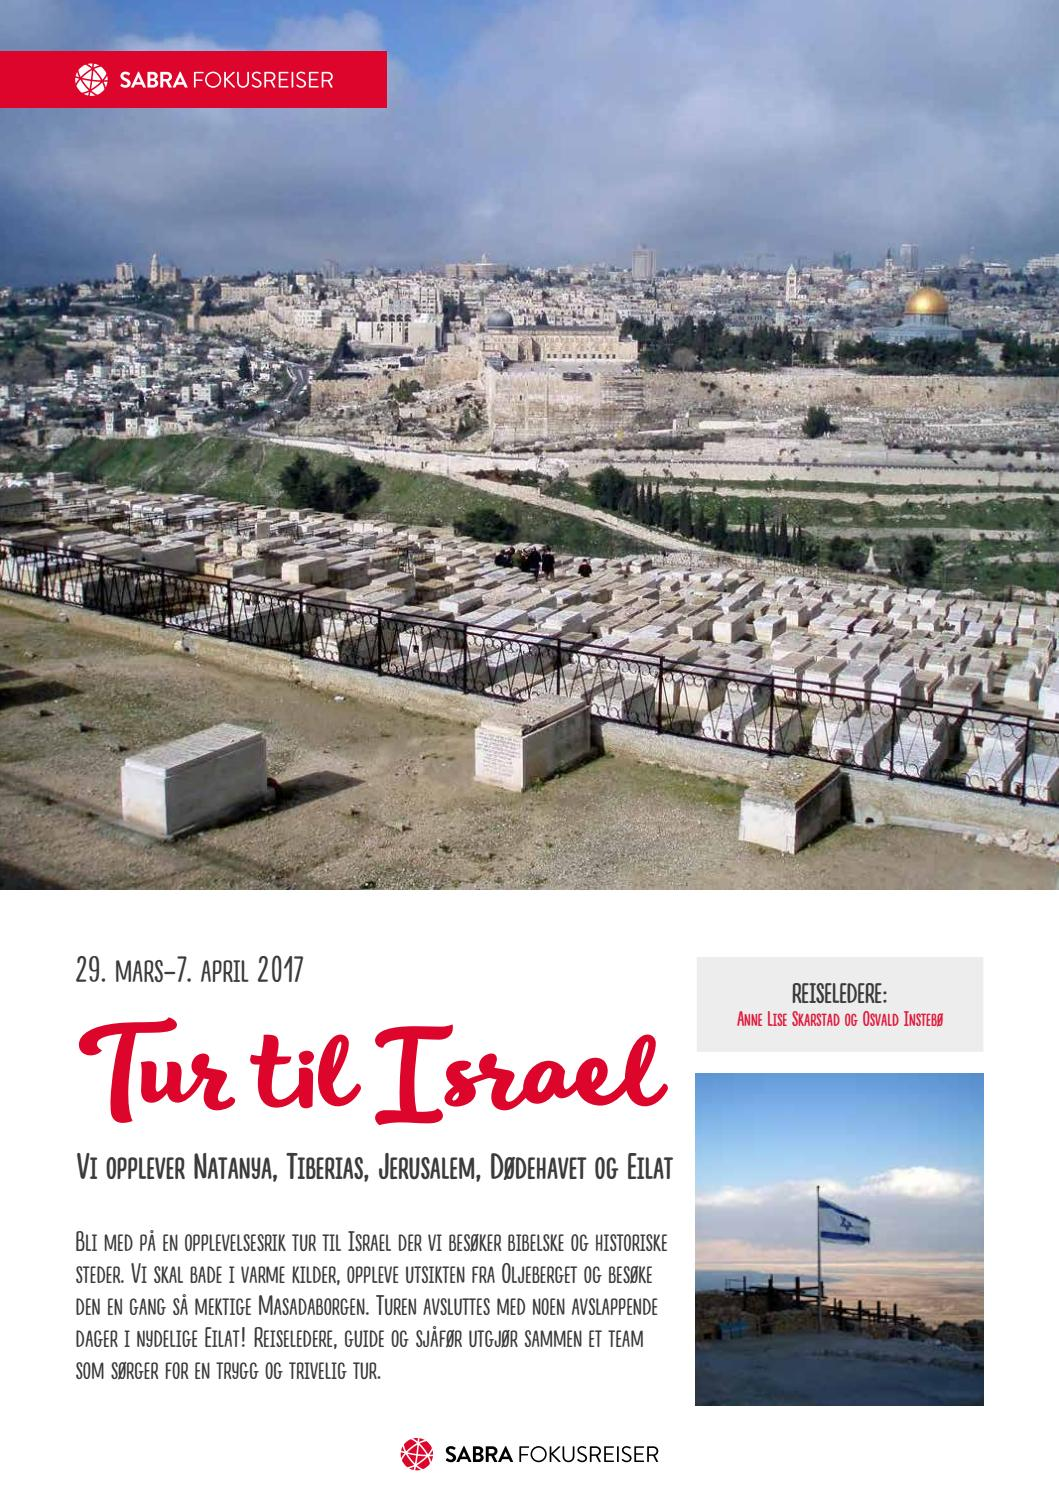 tur til israel